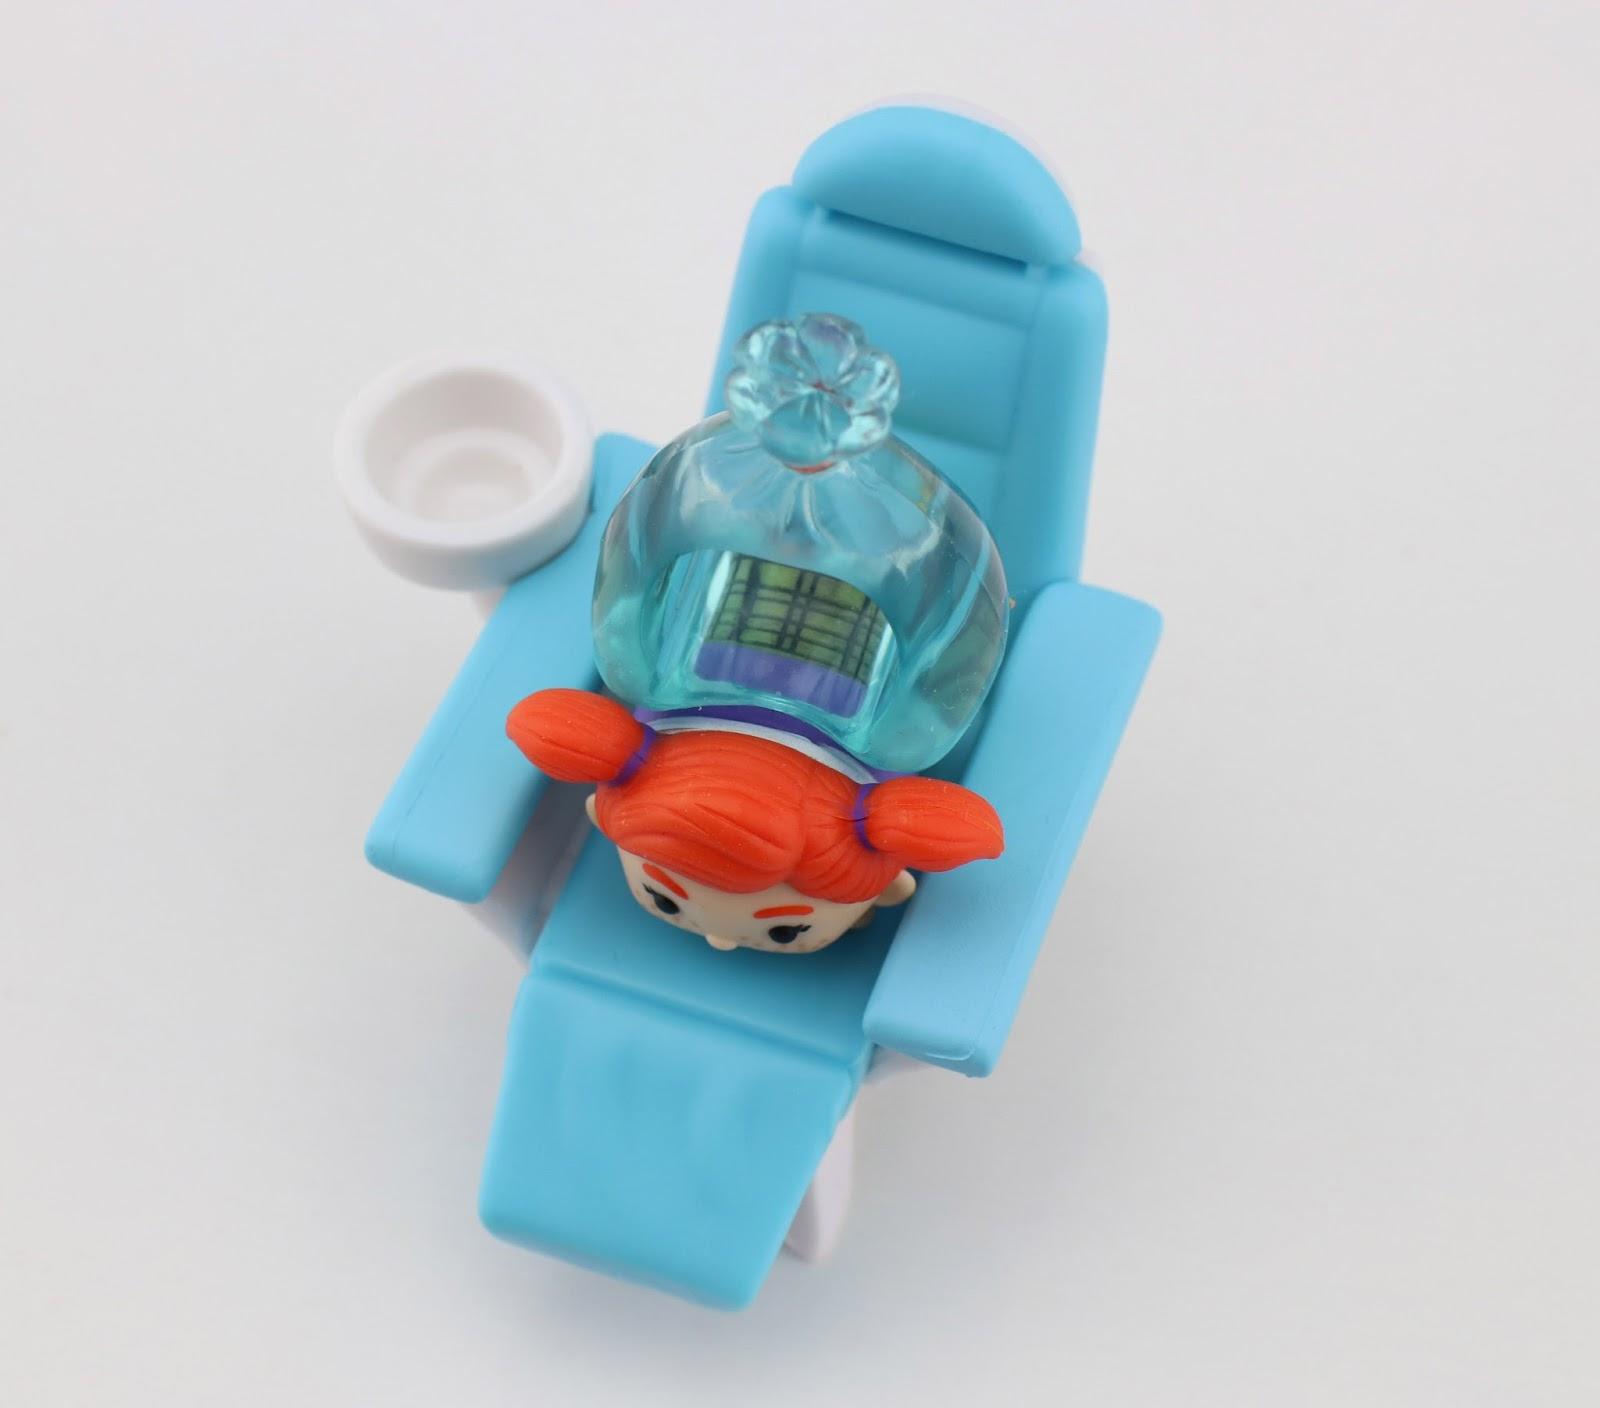 Disney Tsum Tsum Mystery Packs by Jakks Pacific Series 9 Pixar darla